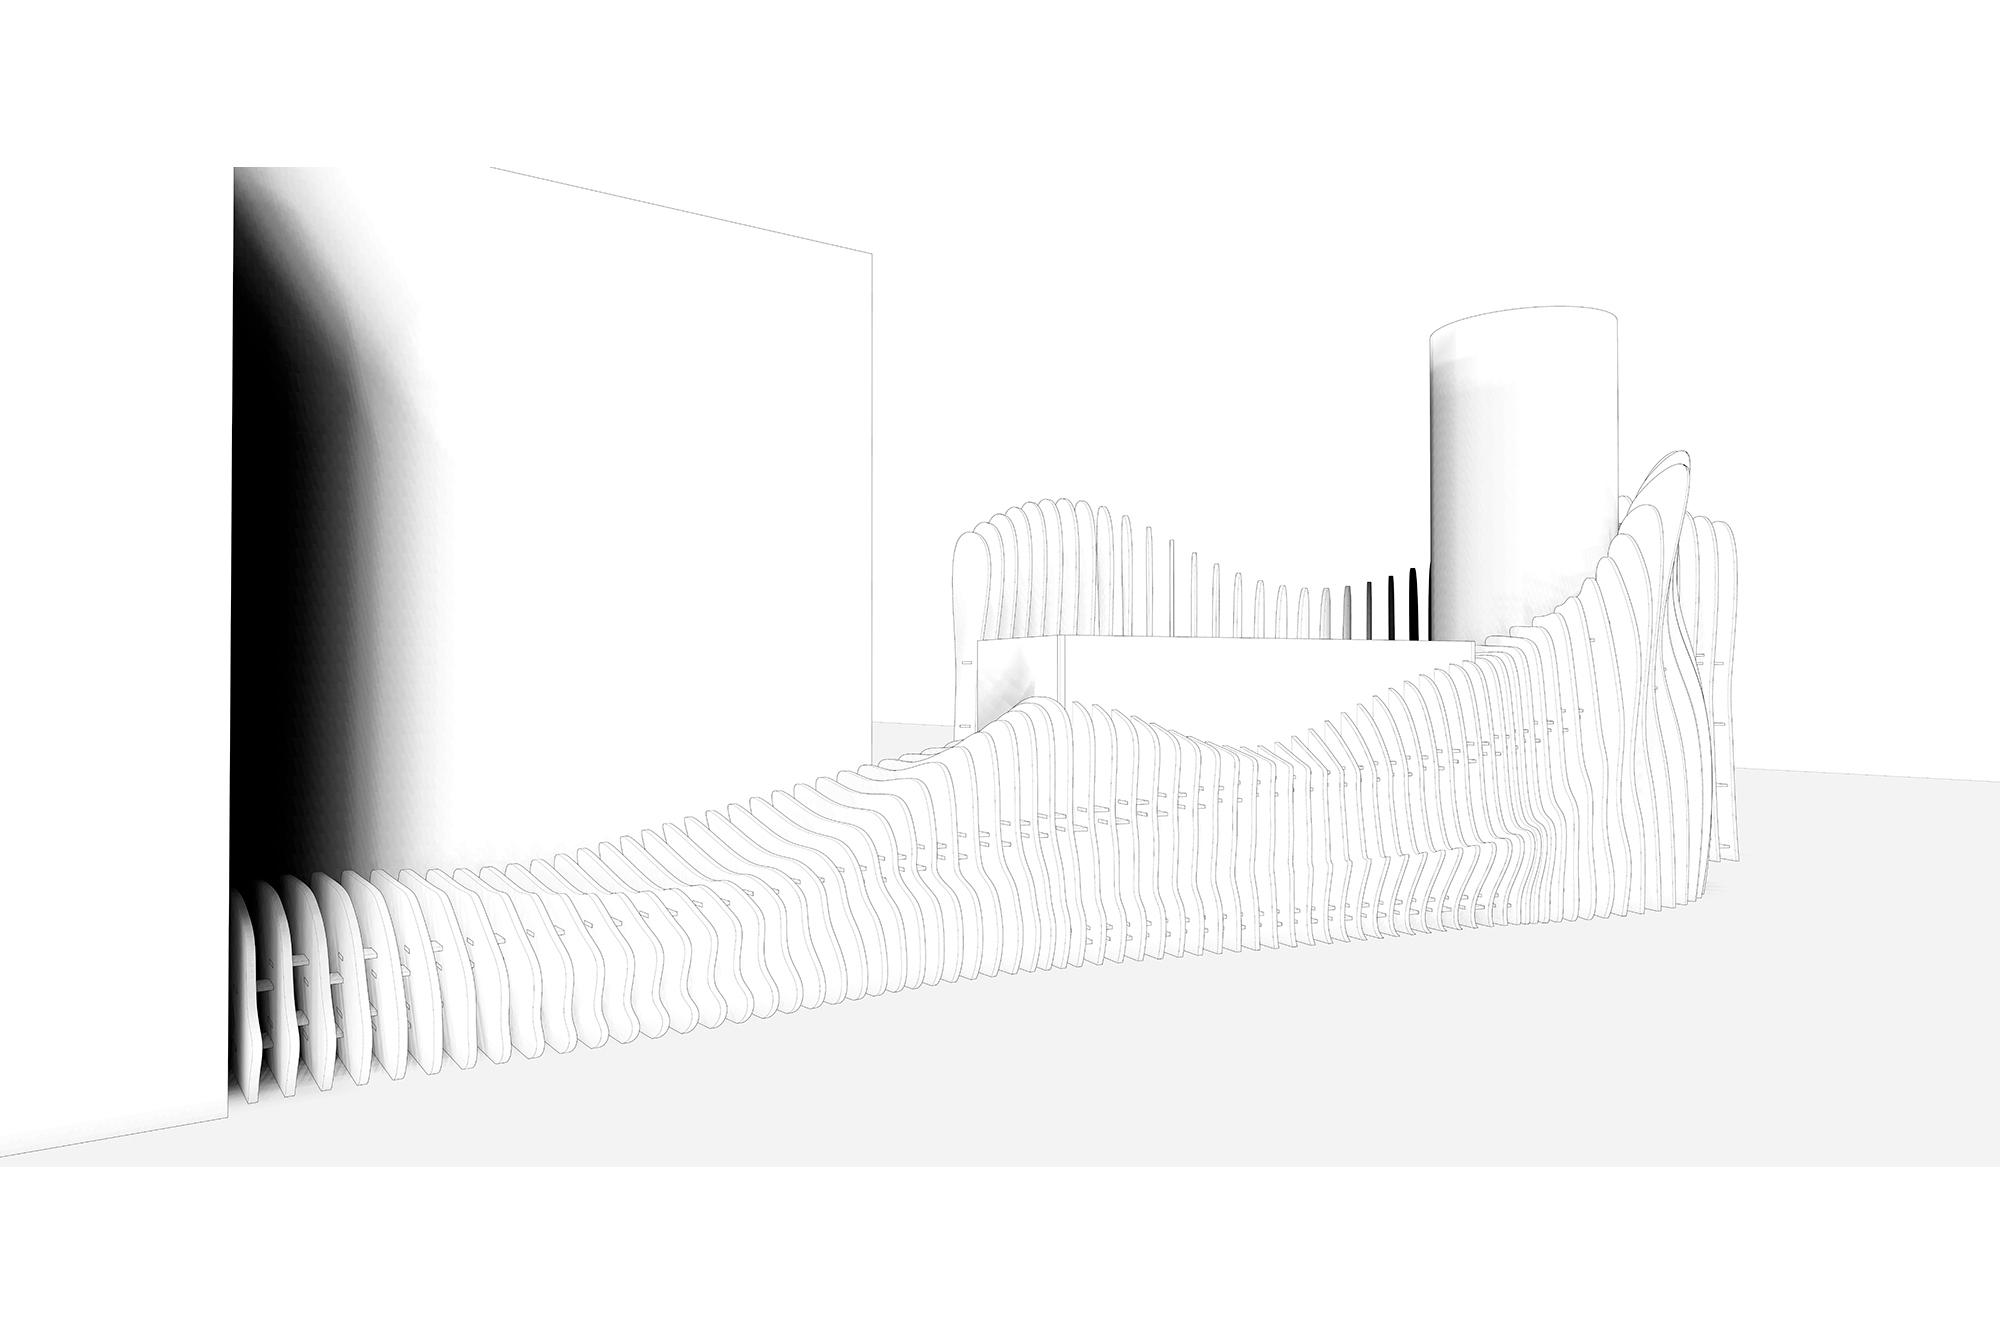 Internos-_-Diseño-_-EXarchitects_010